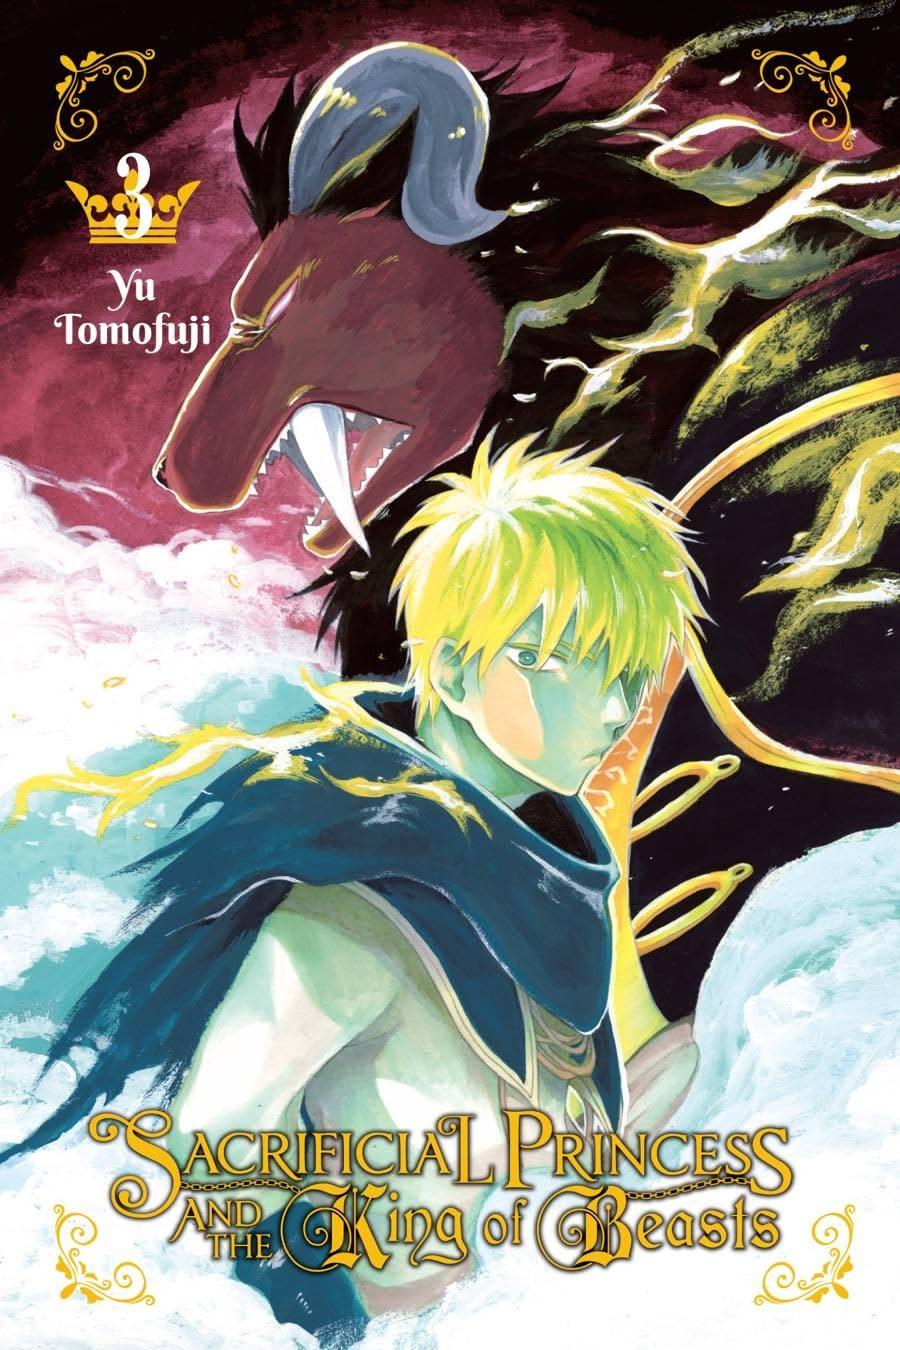 Sacrificial Princess and the King of Beasts Vol. 3